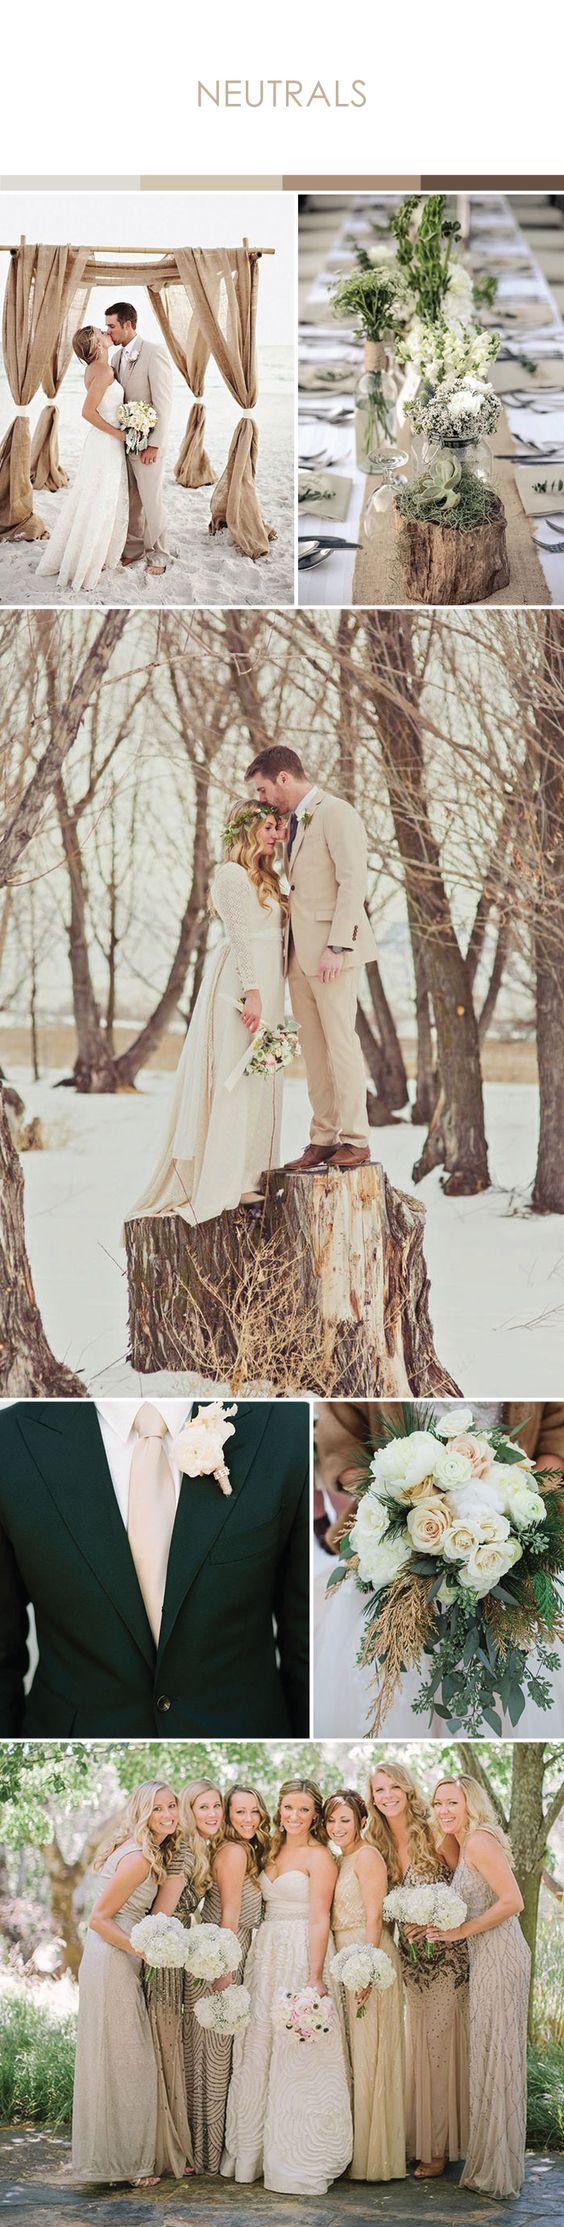 Latte Wedding Ideas  |  Inspiration for Latte + Neutral Toned Weddings.